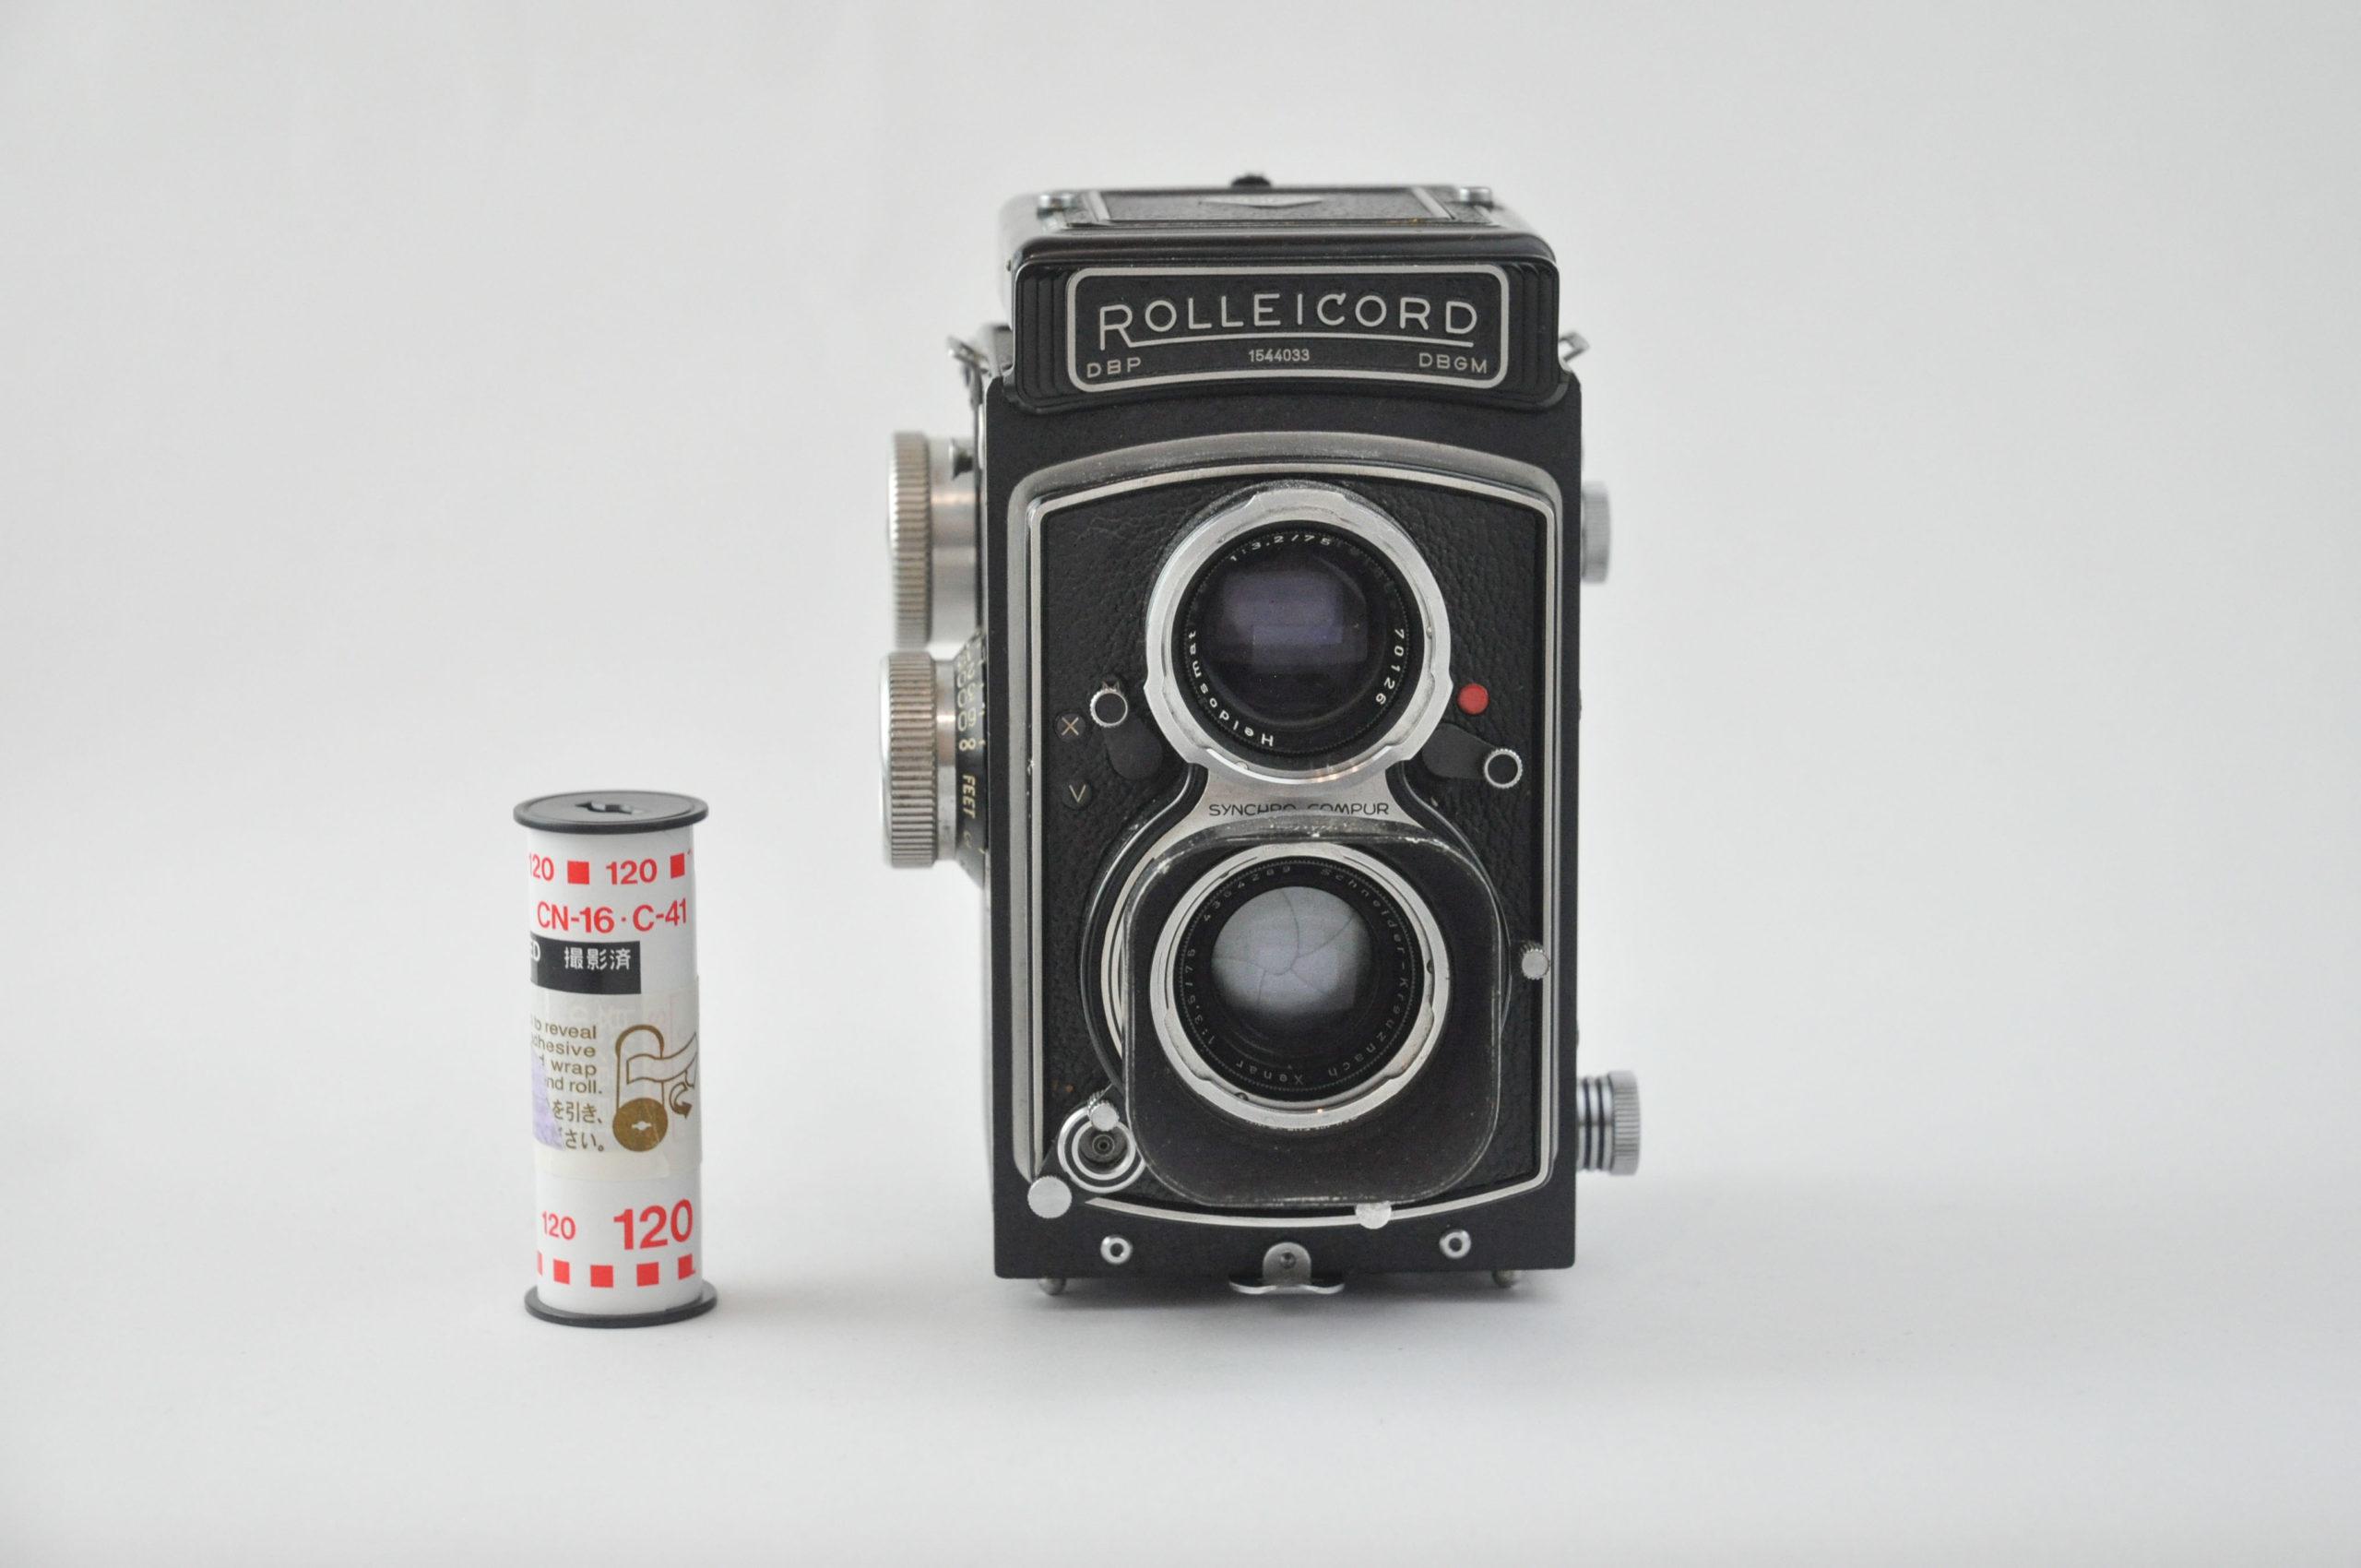 Rolleicord(Xenar 75mm f3.5)